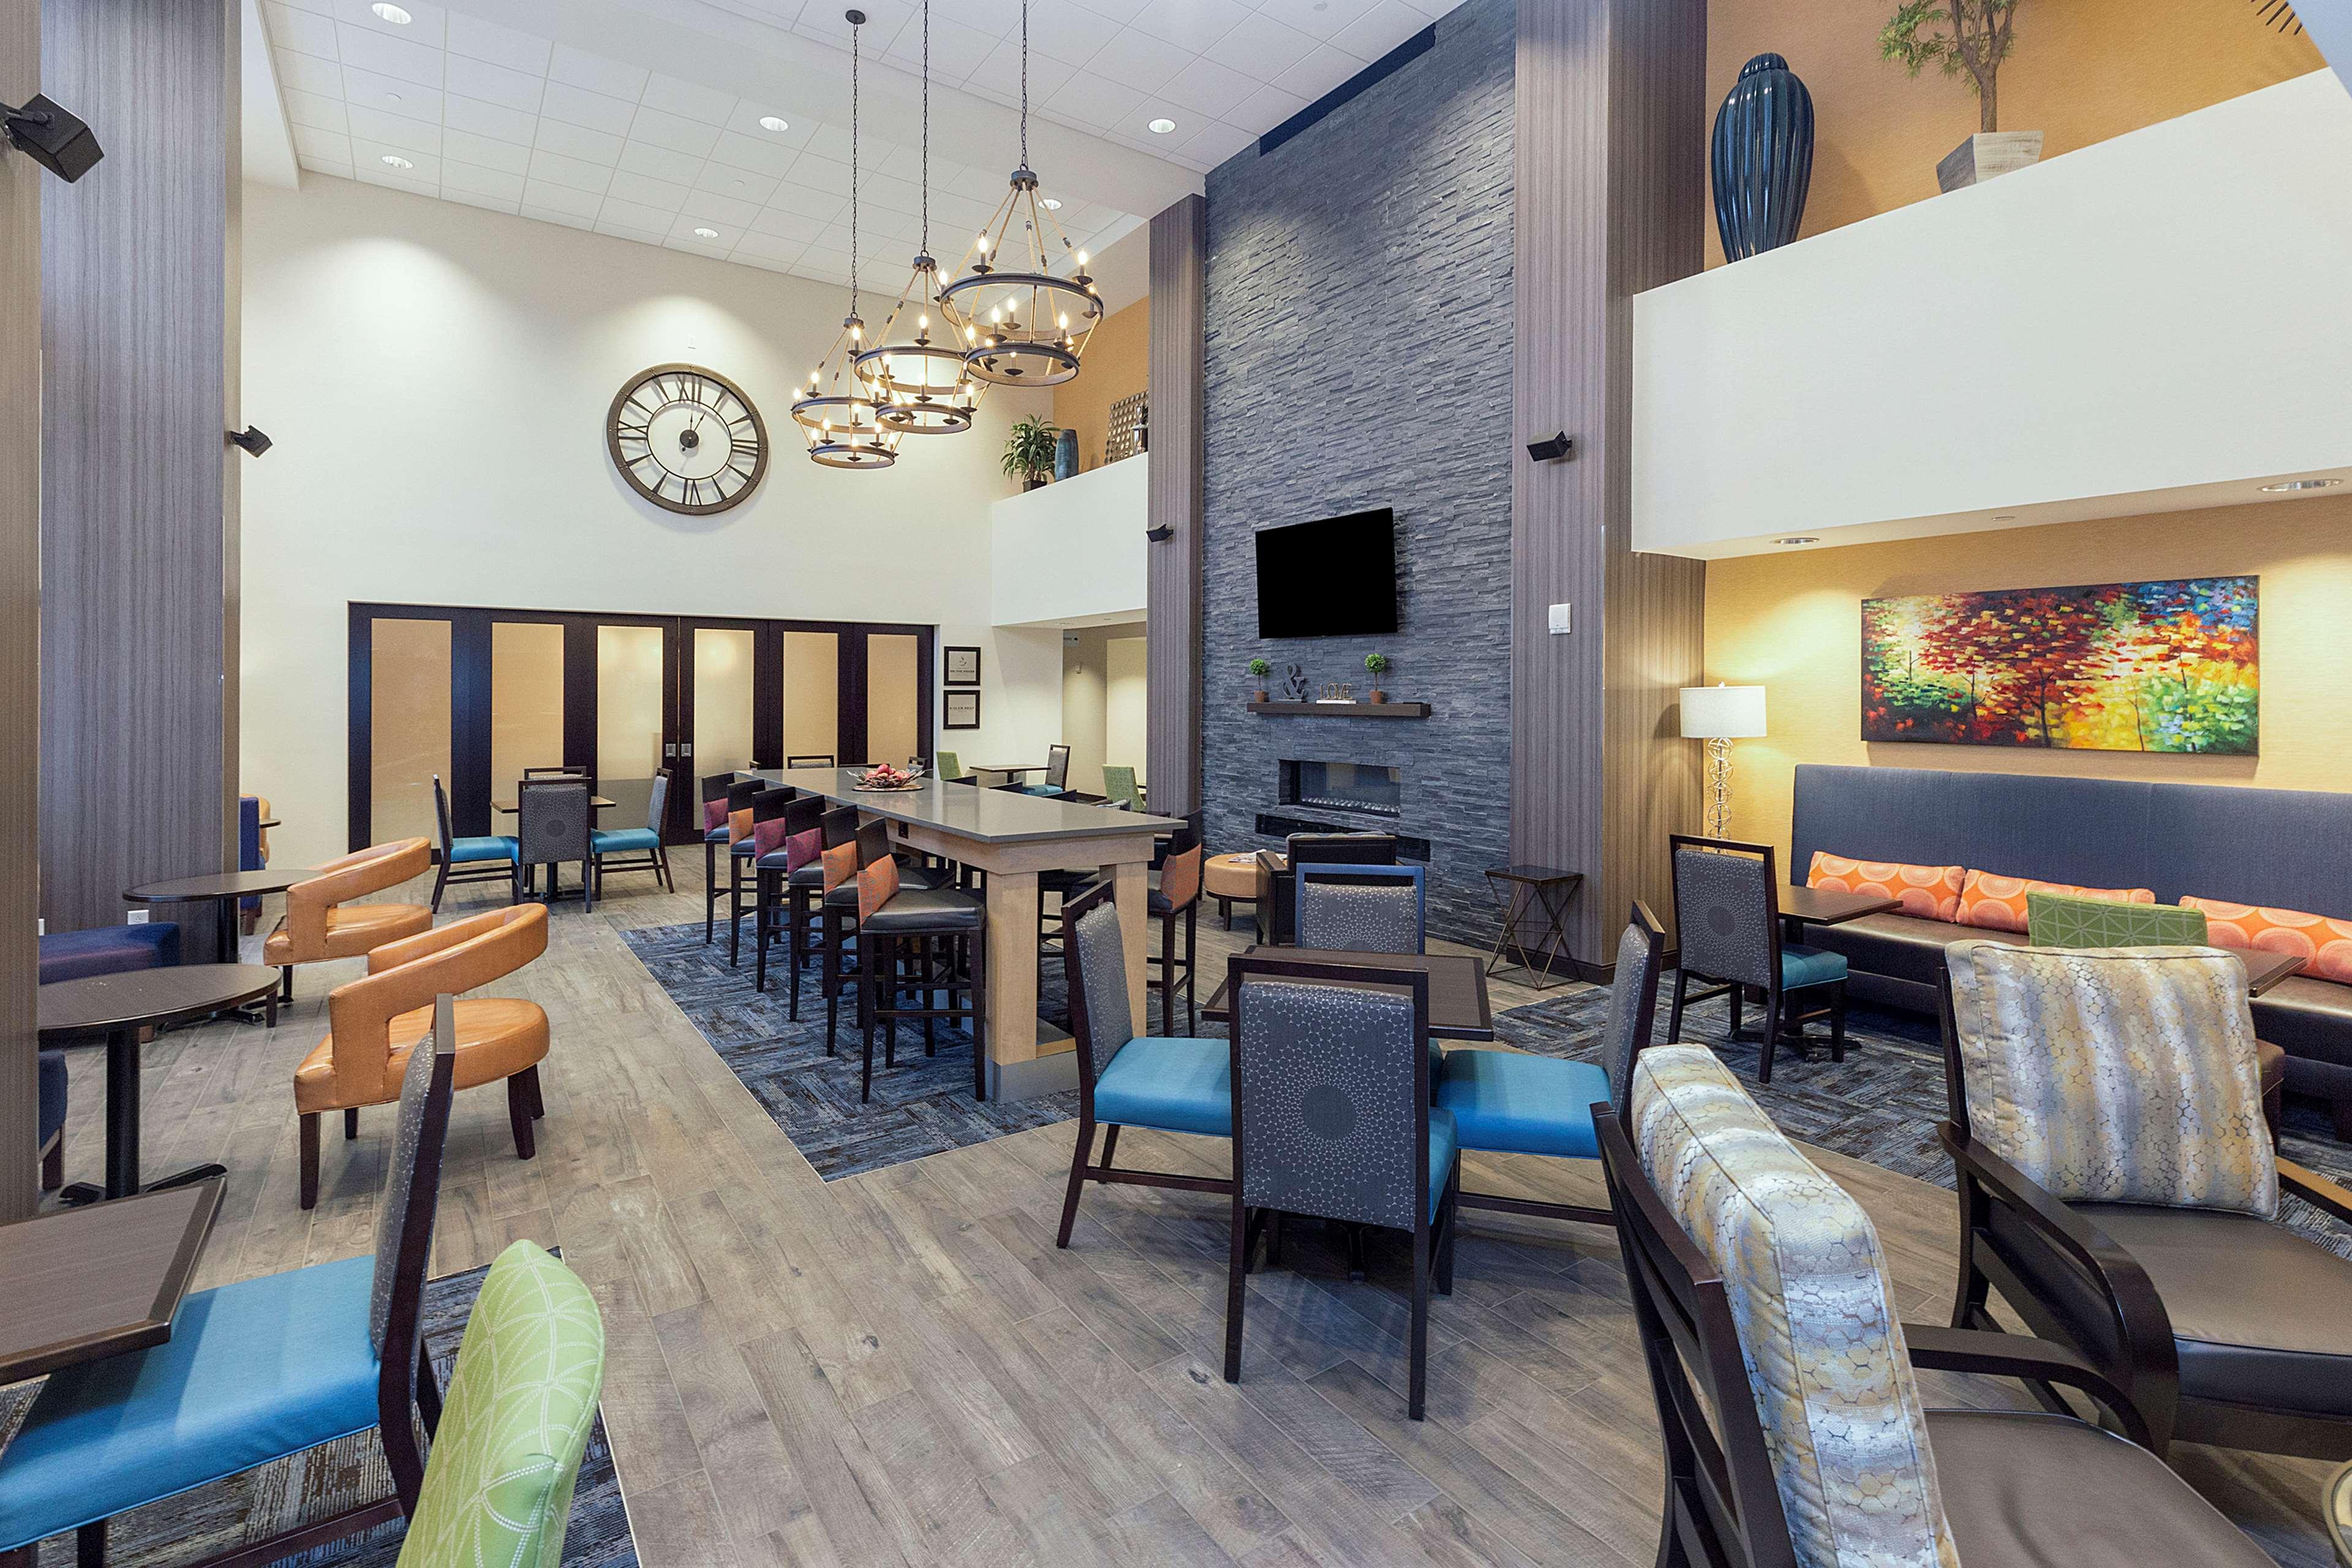 Hampton Inn & Suites Morgantown / University Town Centre image 3